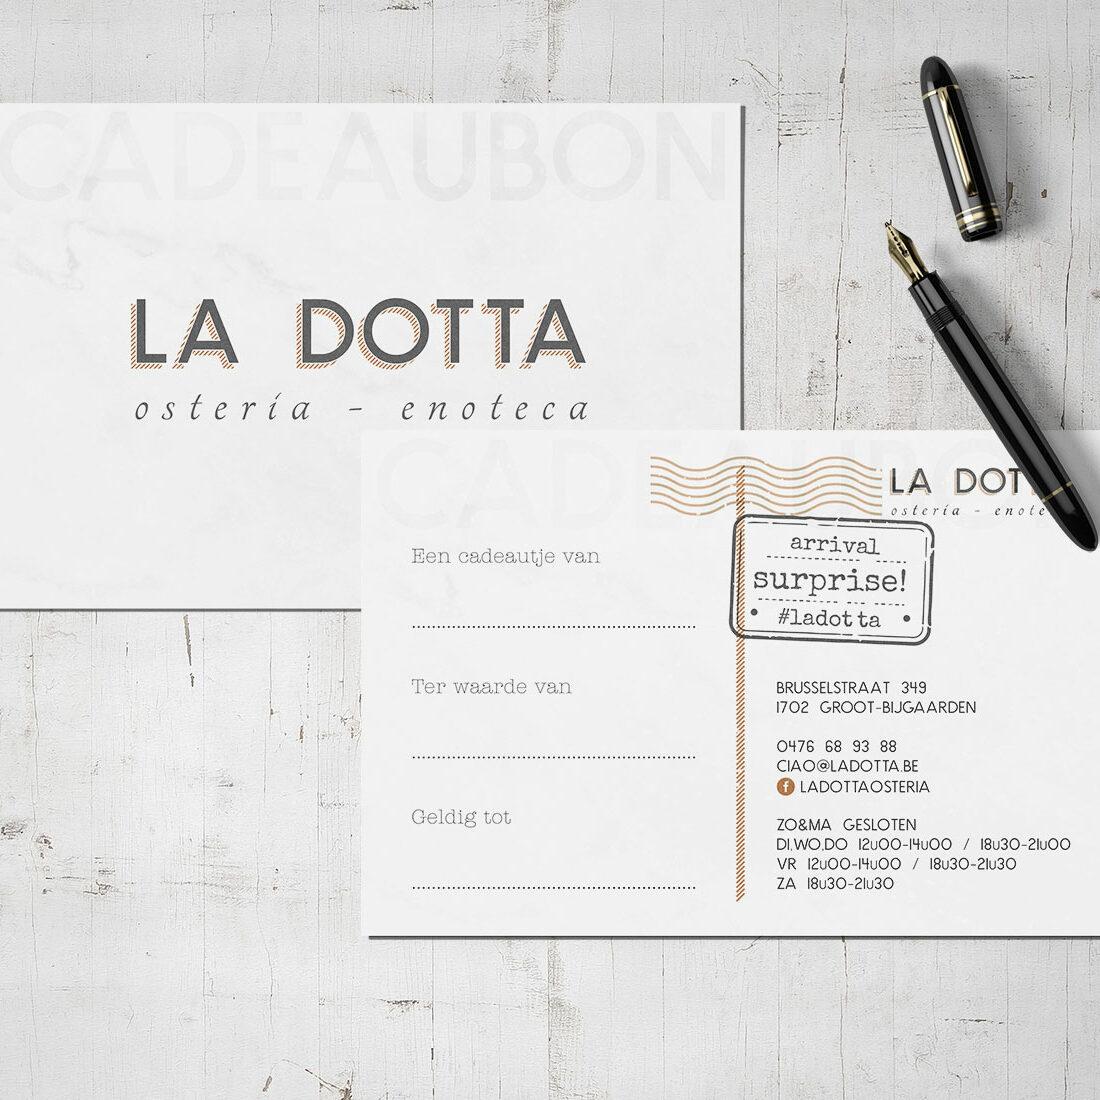 Postcard_A6_LaDotta_presentation